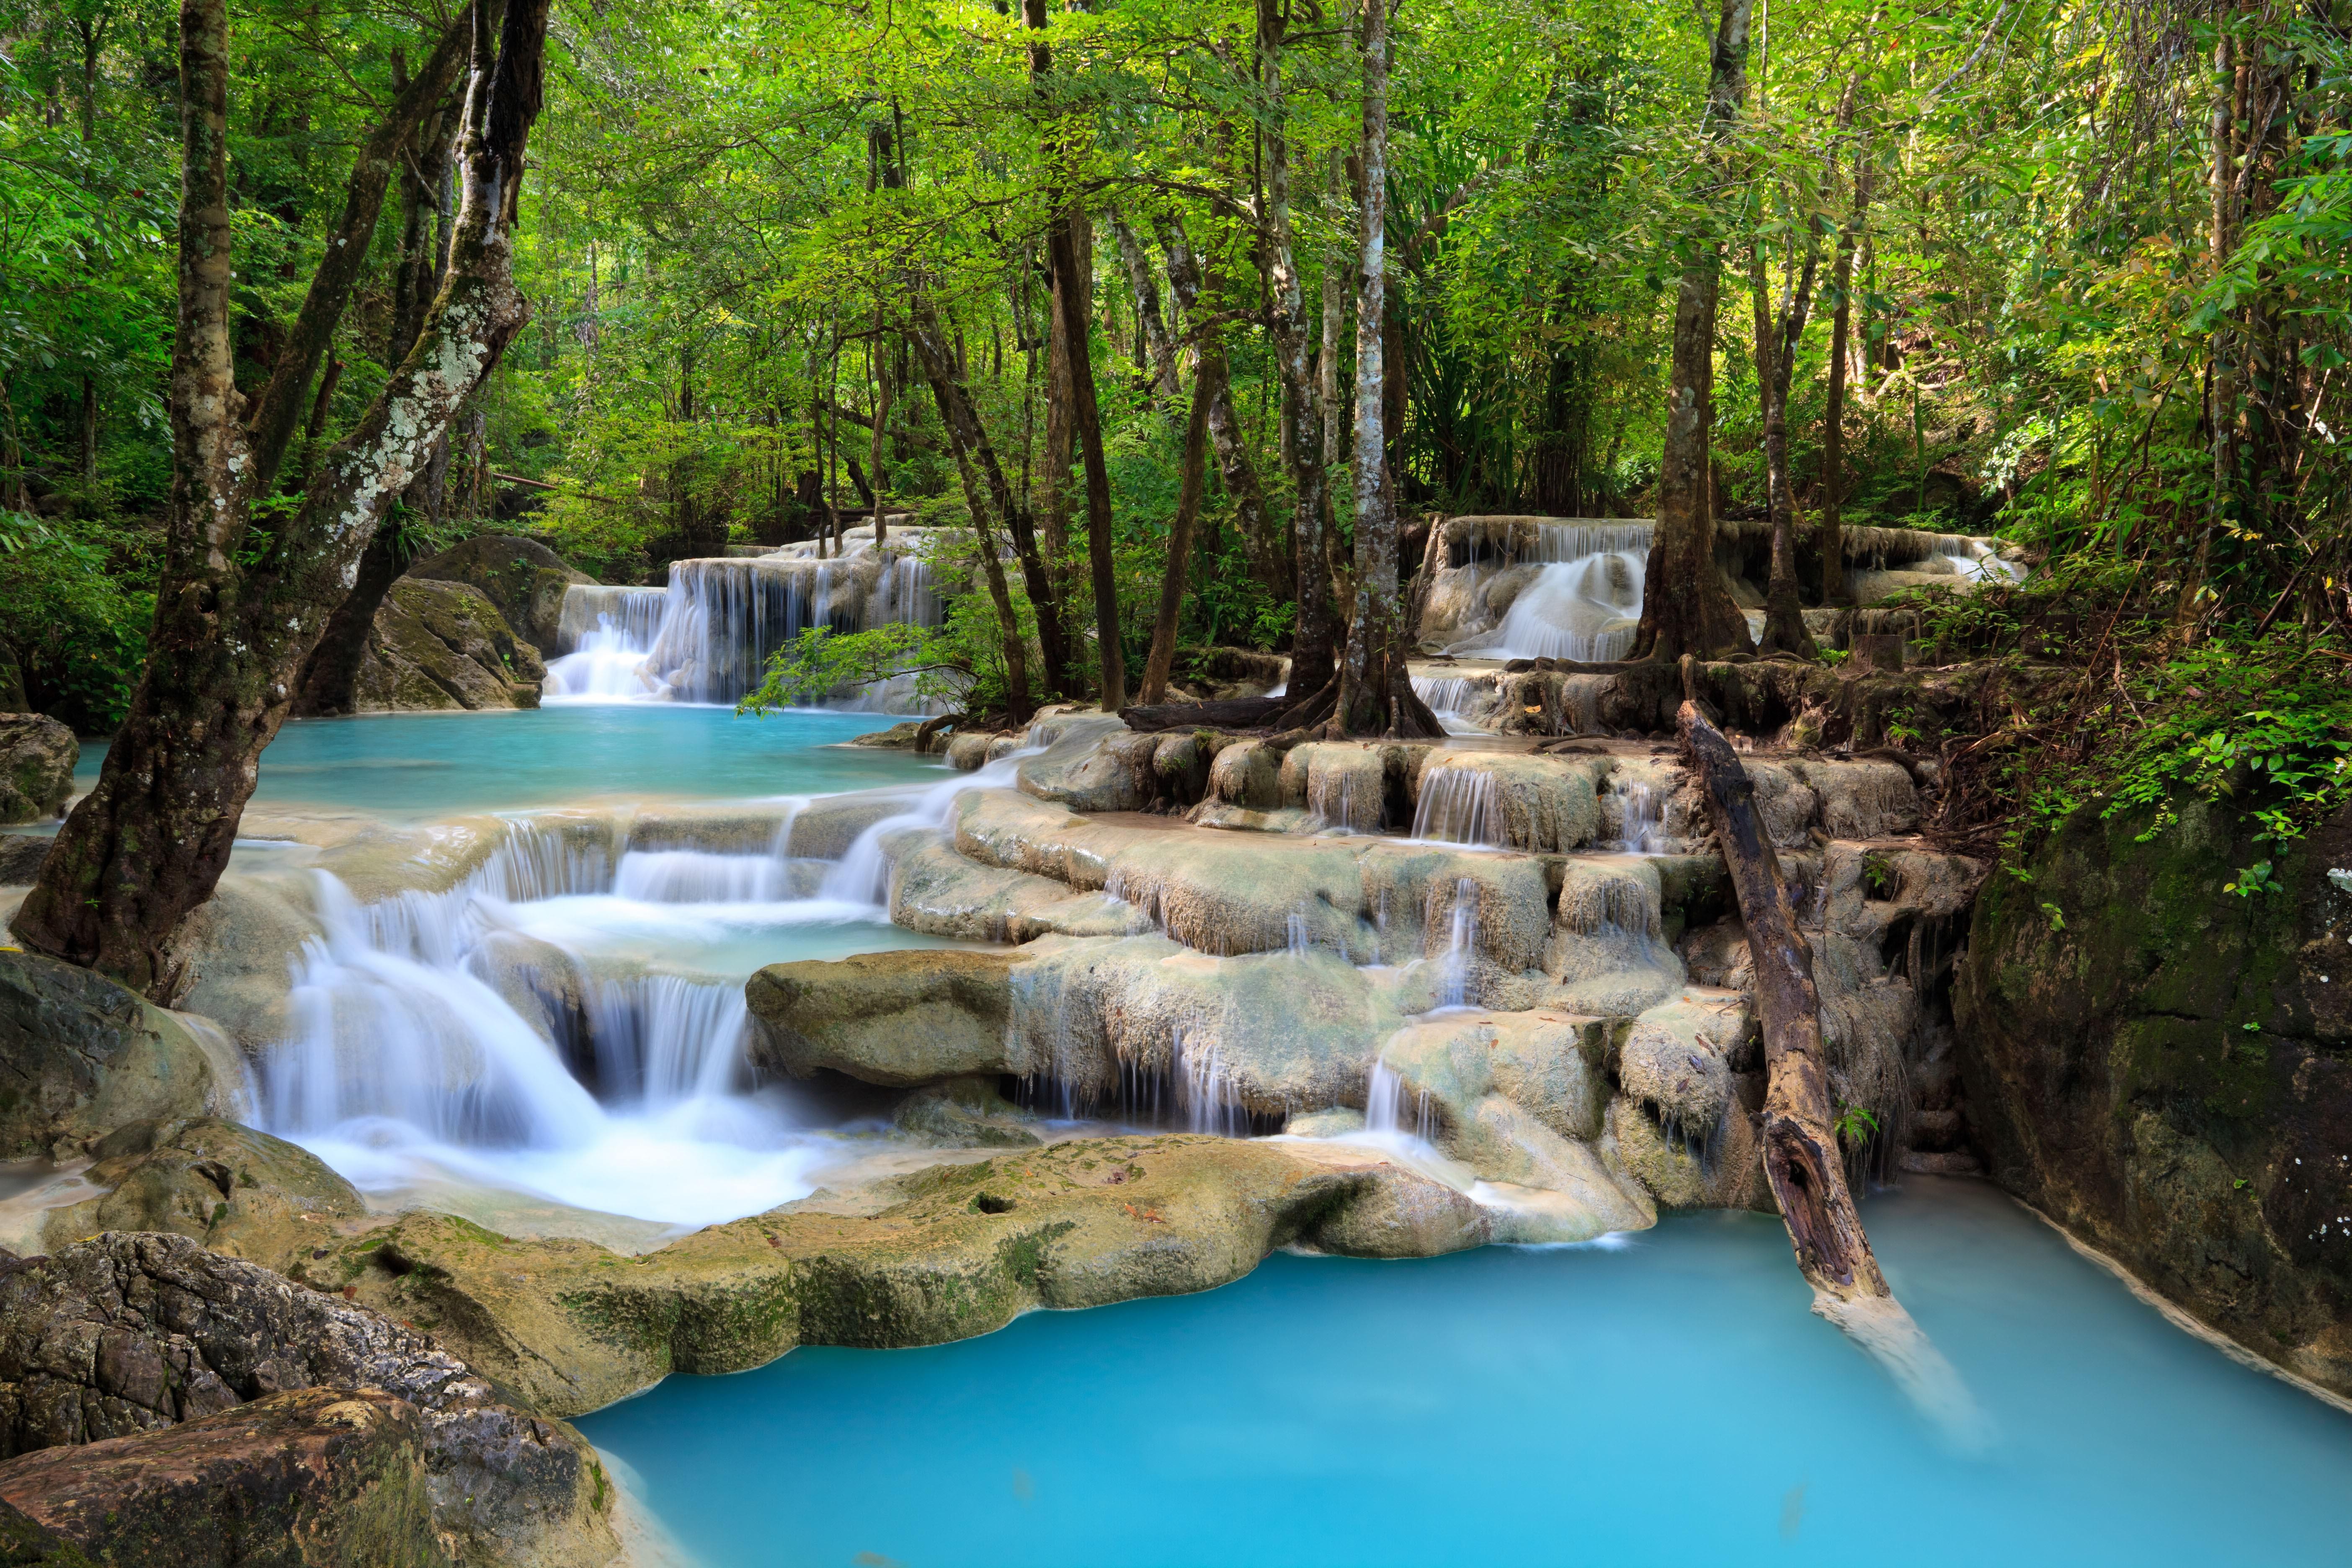 водопад деревья озеро  № 3898805 без смс